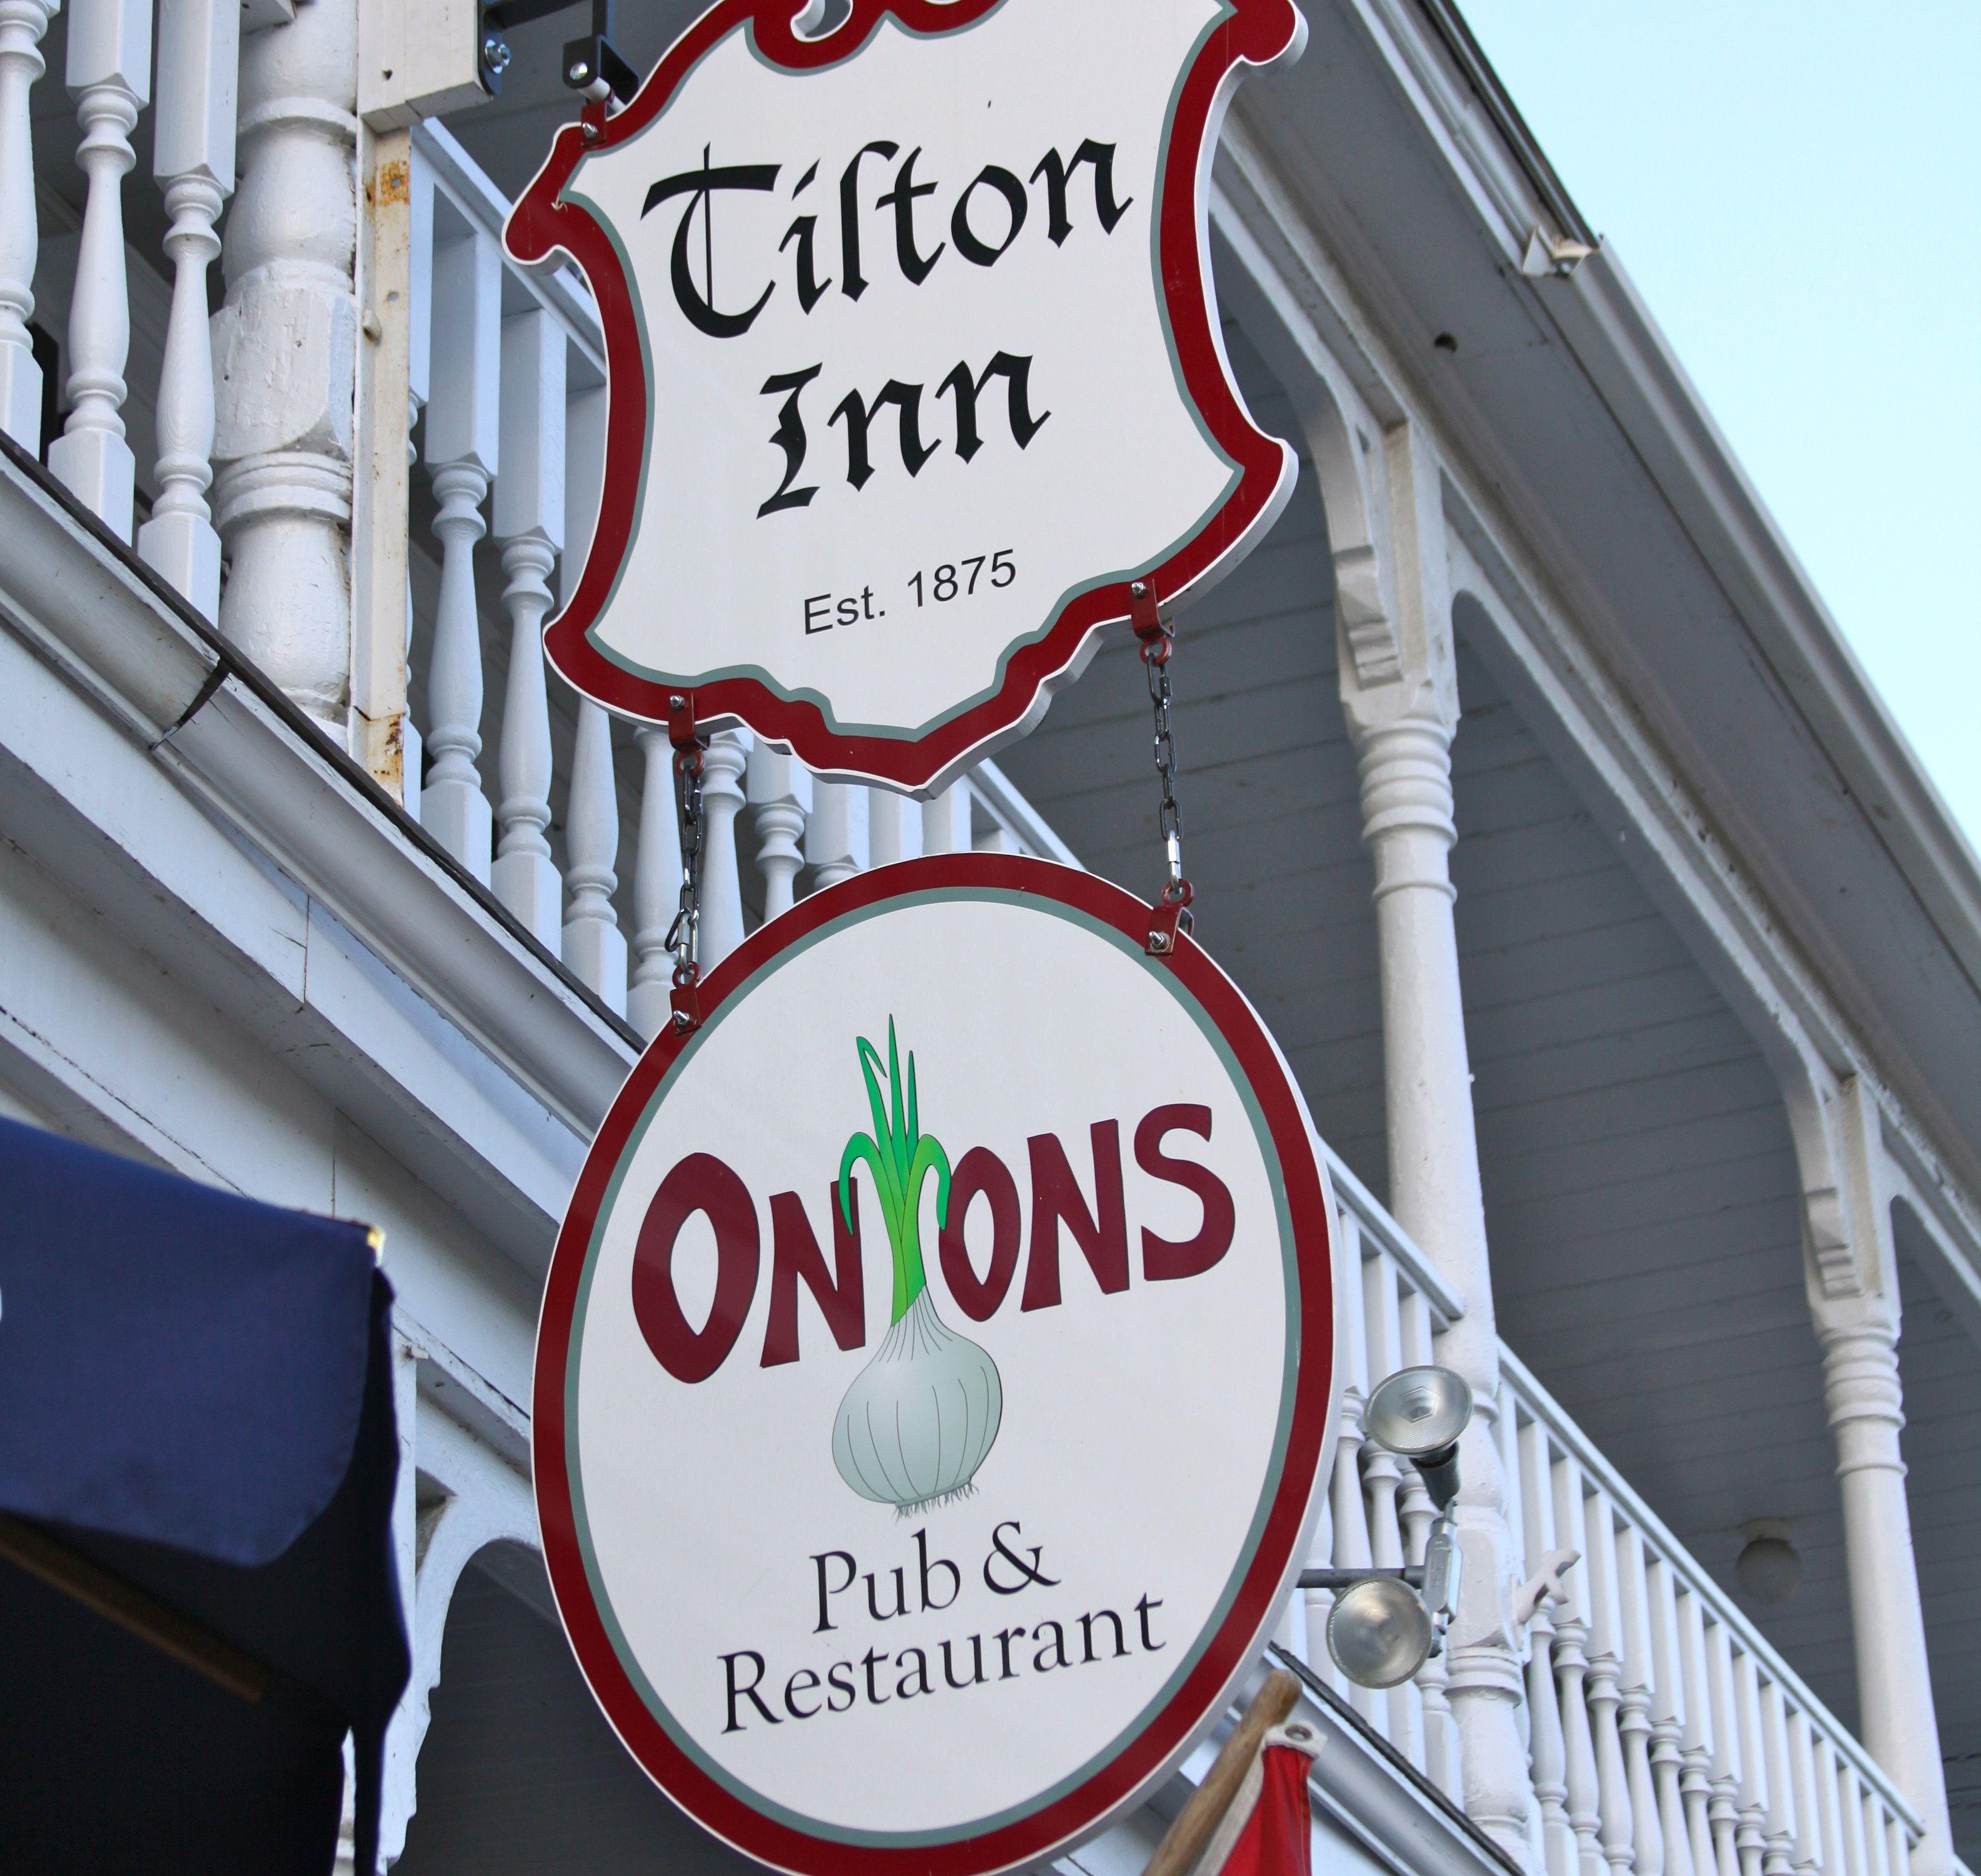 Onions Restaurant Tilton Inn Tilton Nh Restaurant Good Eats Tilton